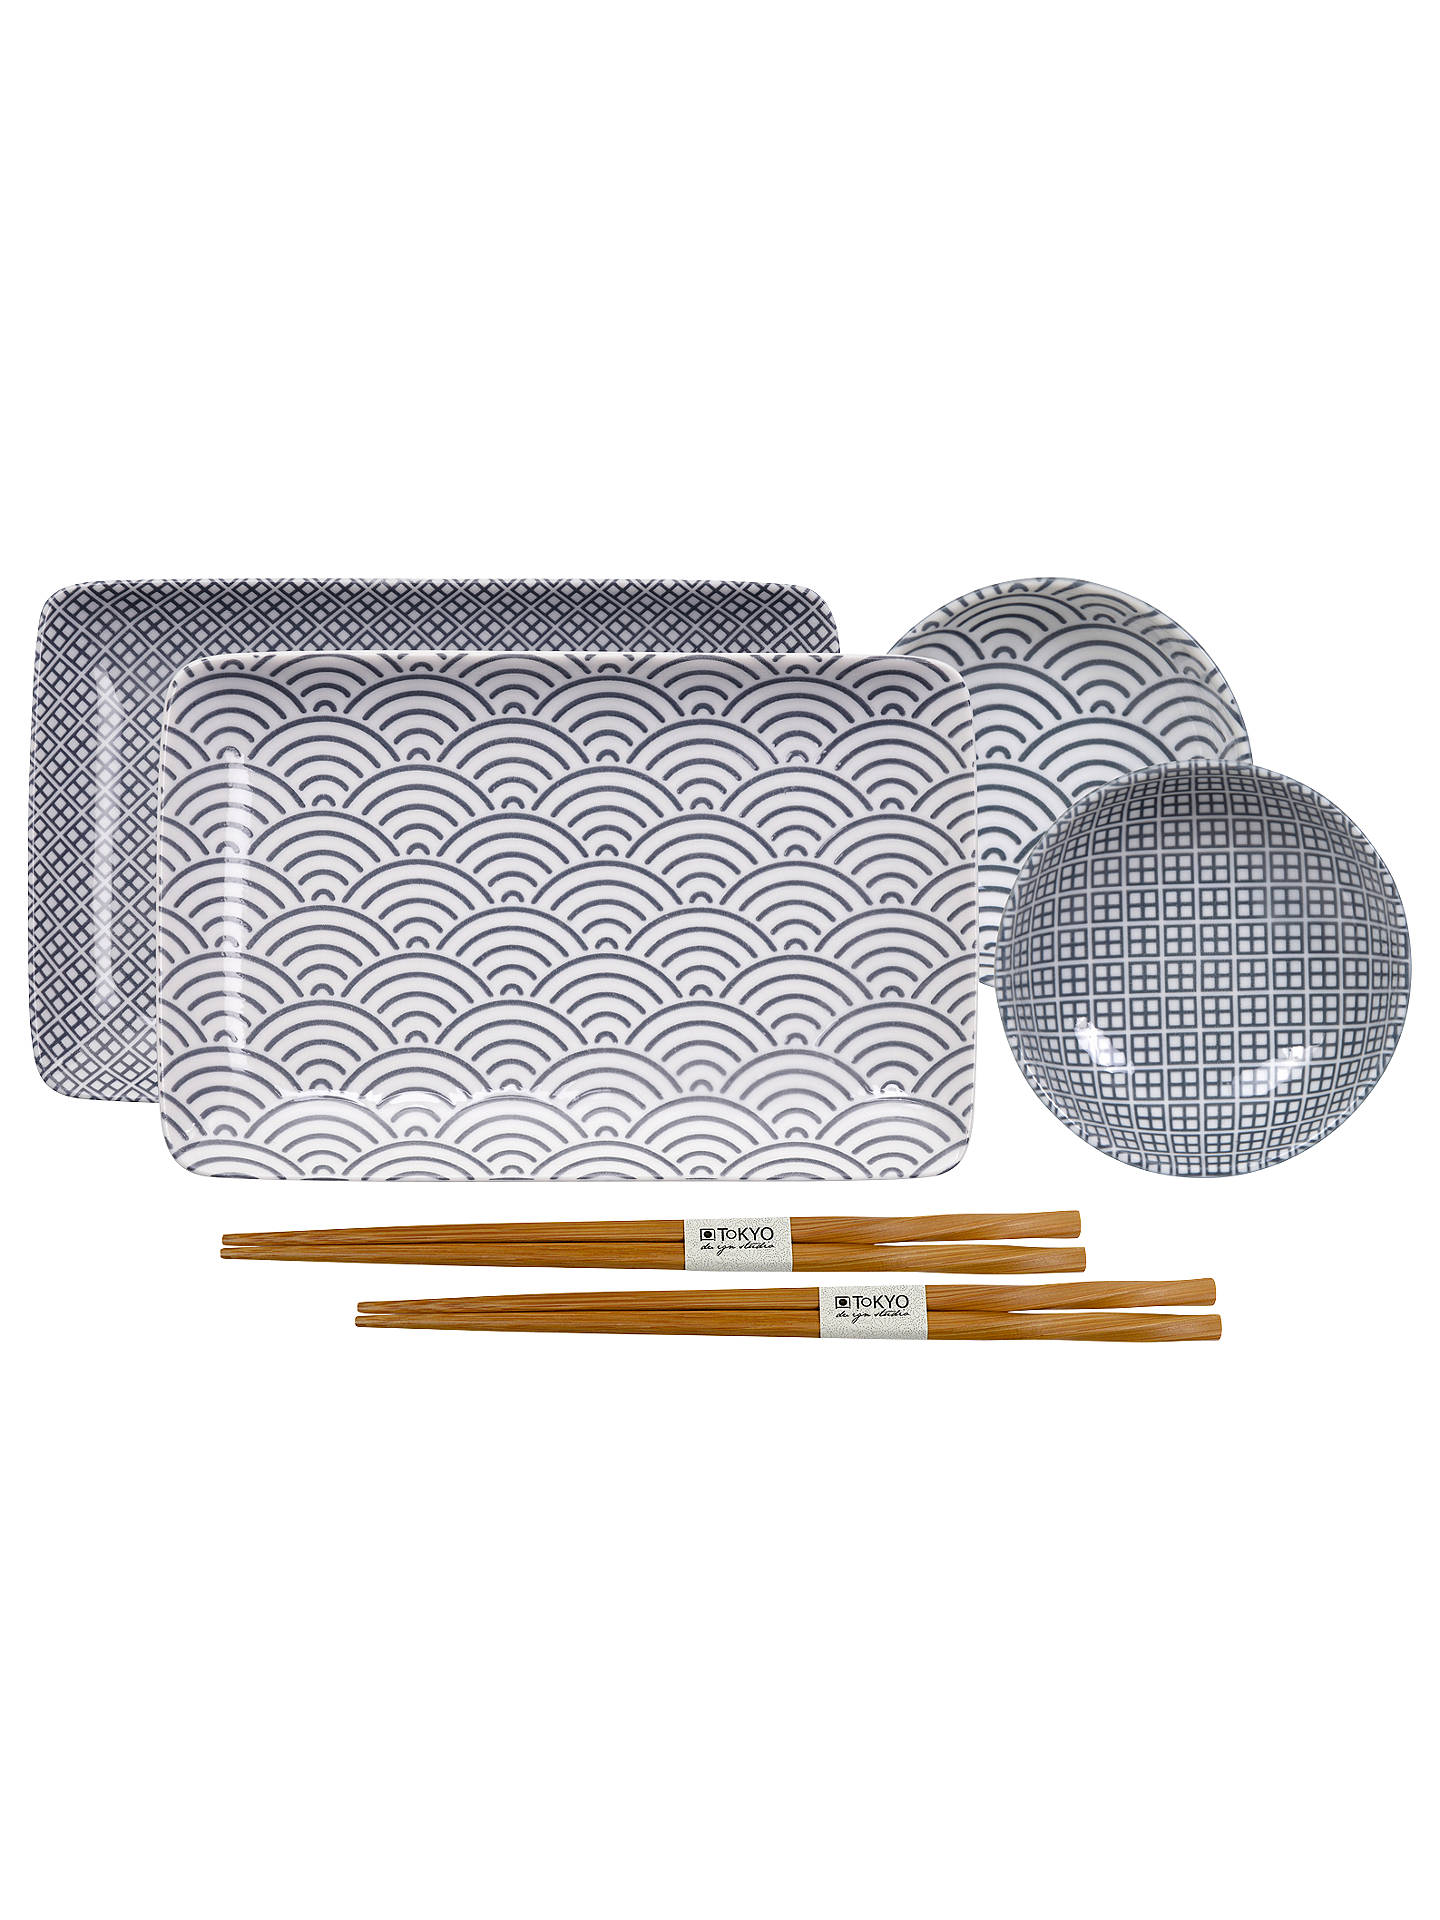 Tokyo Design Studio Nippon Grey Plate Gift Set, Set of 6, White/Black